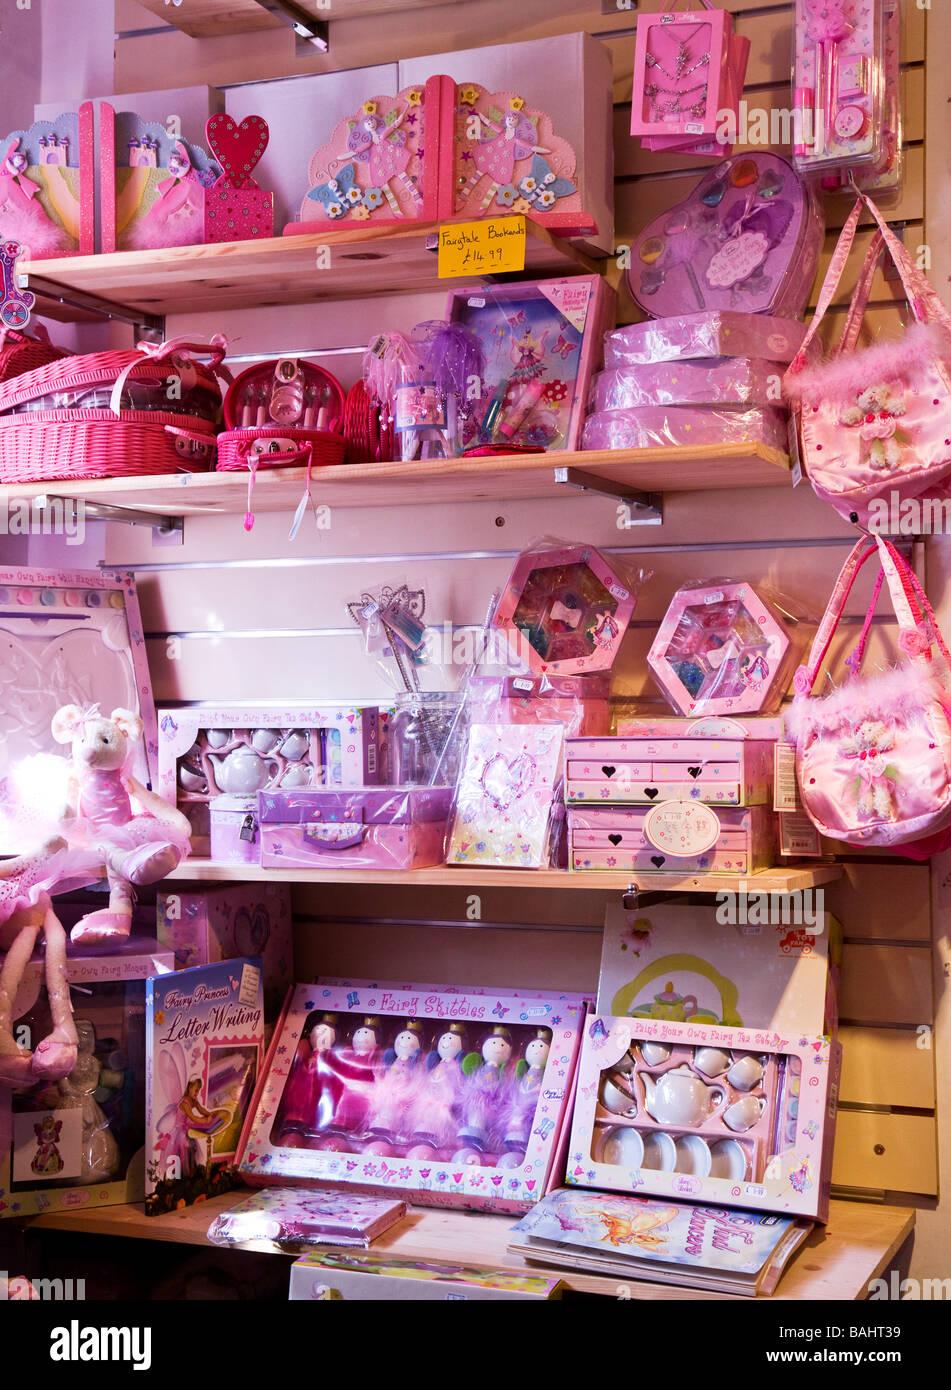 Shelves Of Pink Little Girls Fairy Lucy Locket Toys Inside